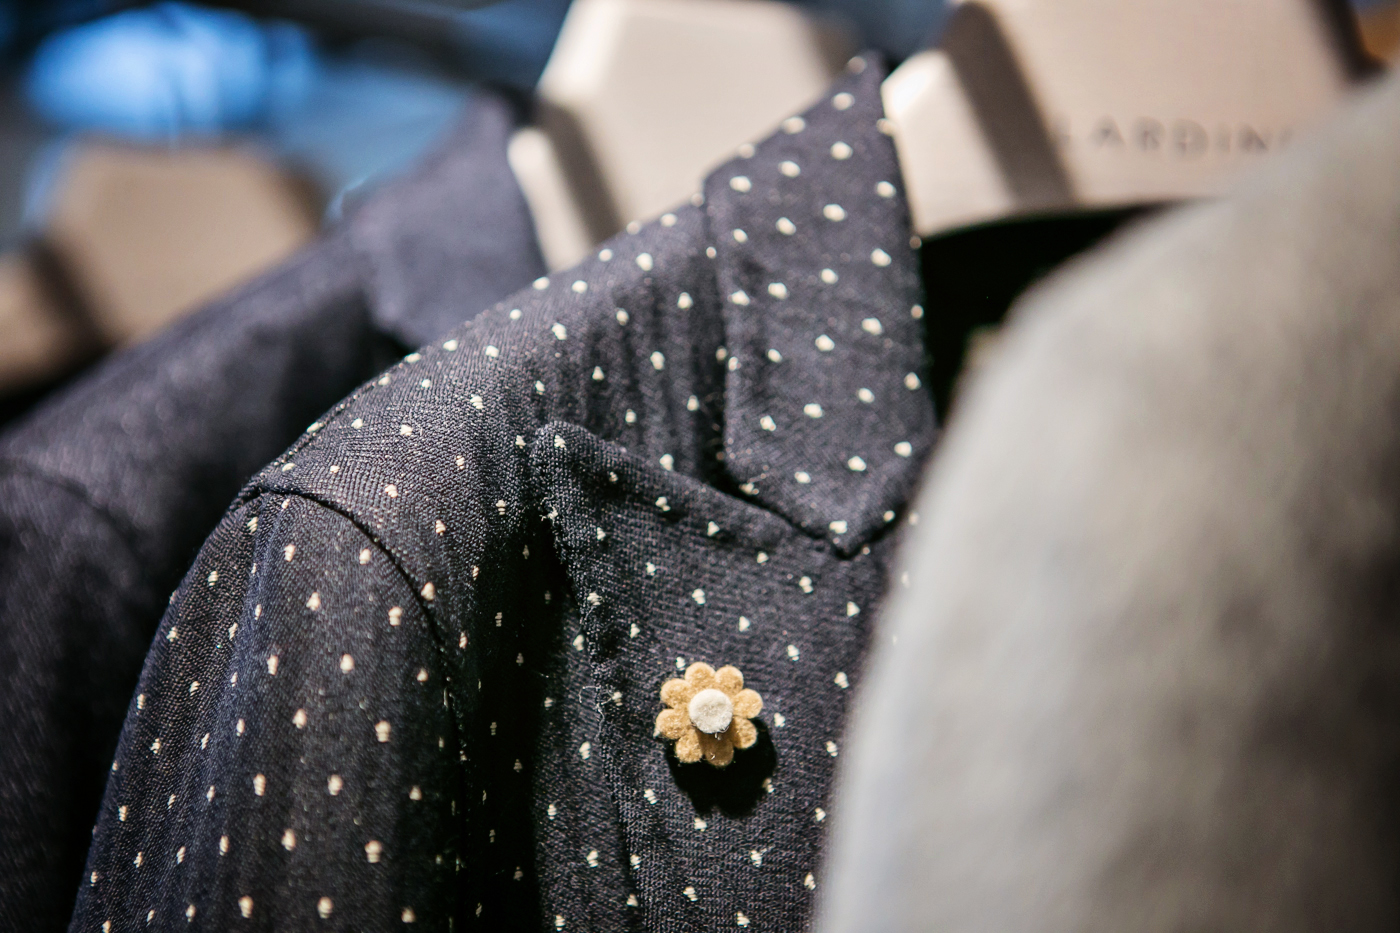 darya kamalova from thecablook com on lardini presentation in Milan and in attila showroom wearing lardini perfect black jacket with marni retro clutch and sophia webster kitten heels-17